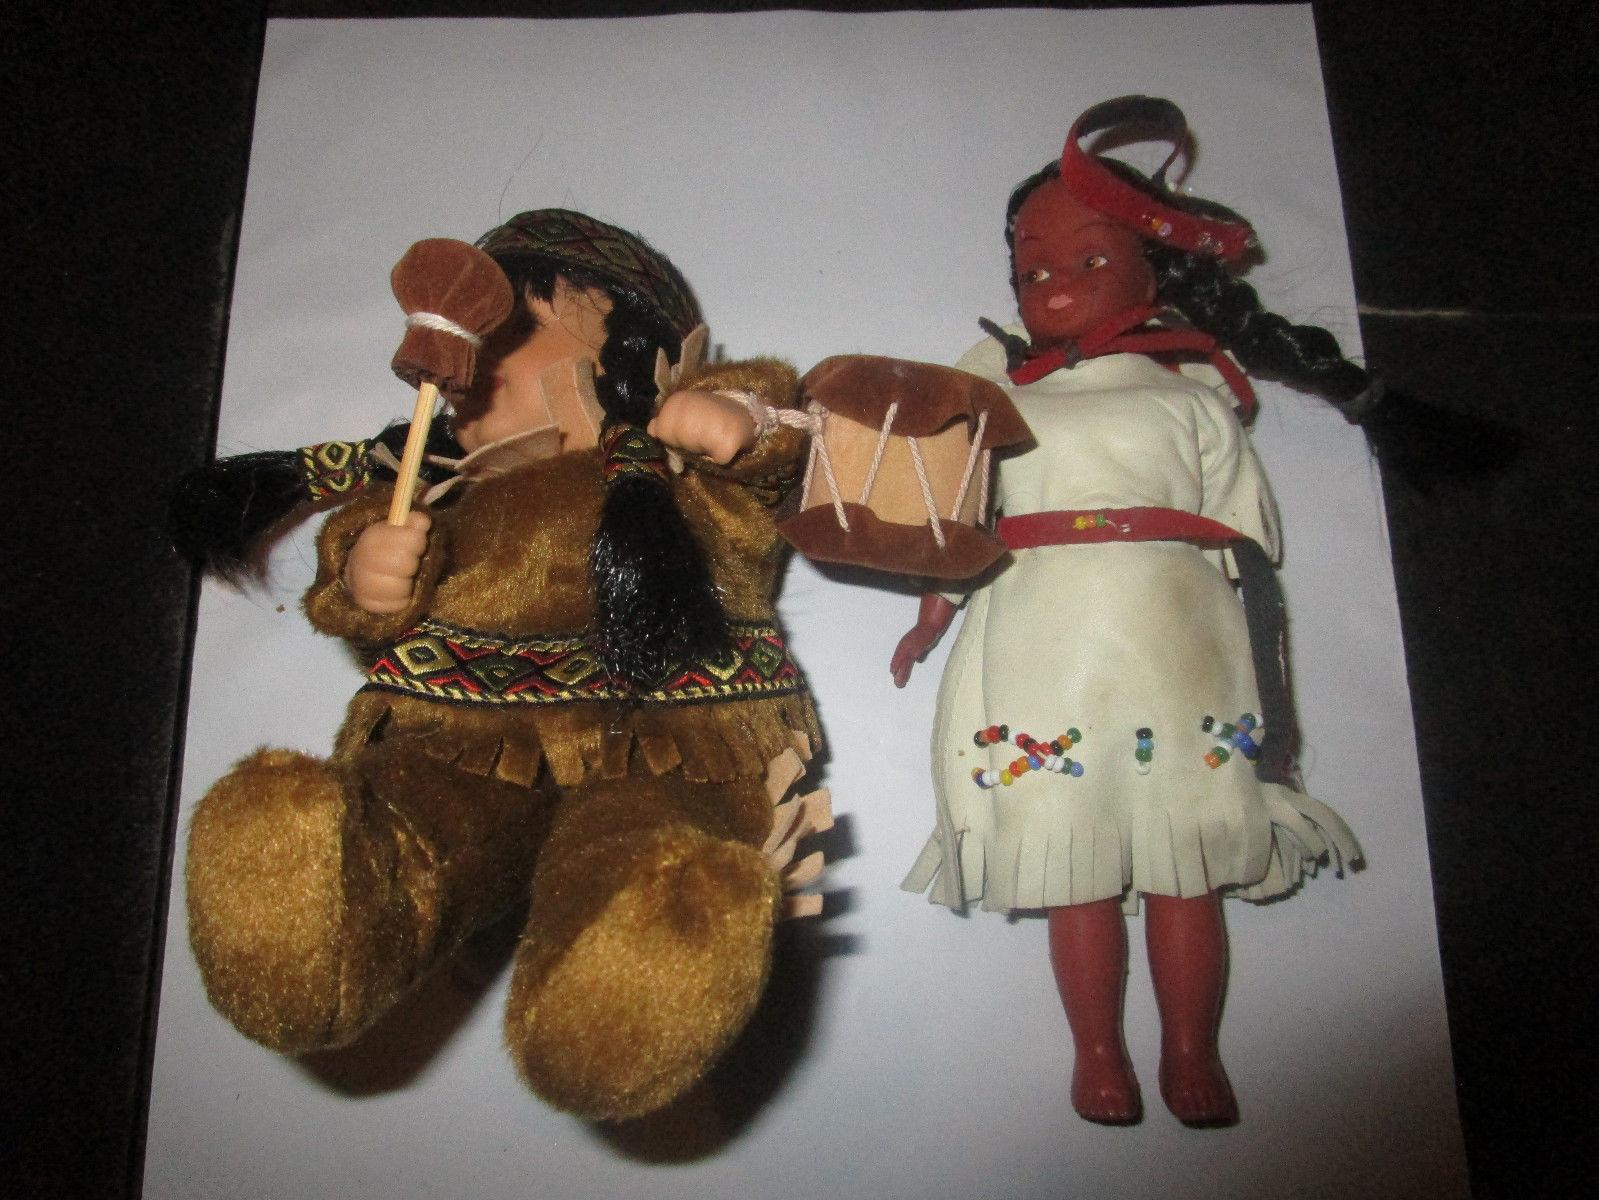 Native America 2 Small Dolls 1 Plastic 1 Porcelain